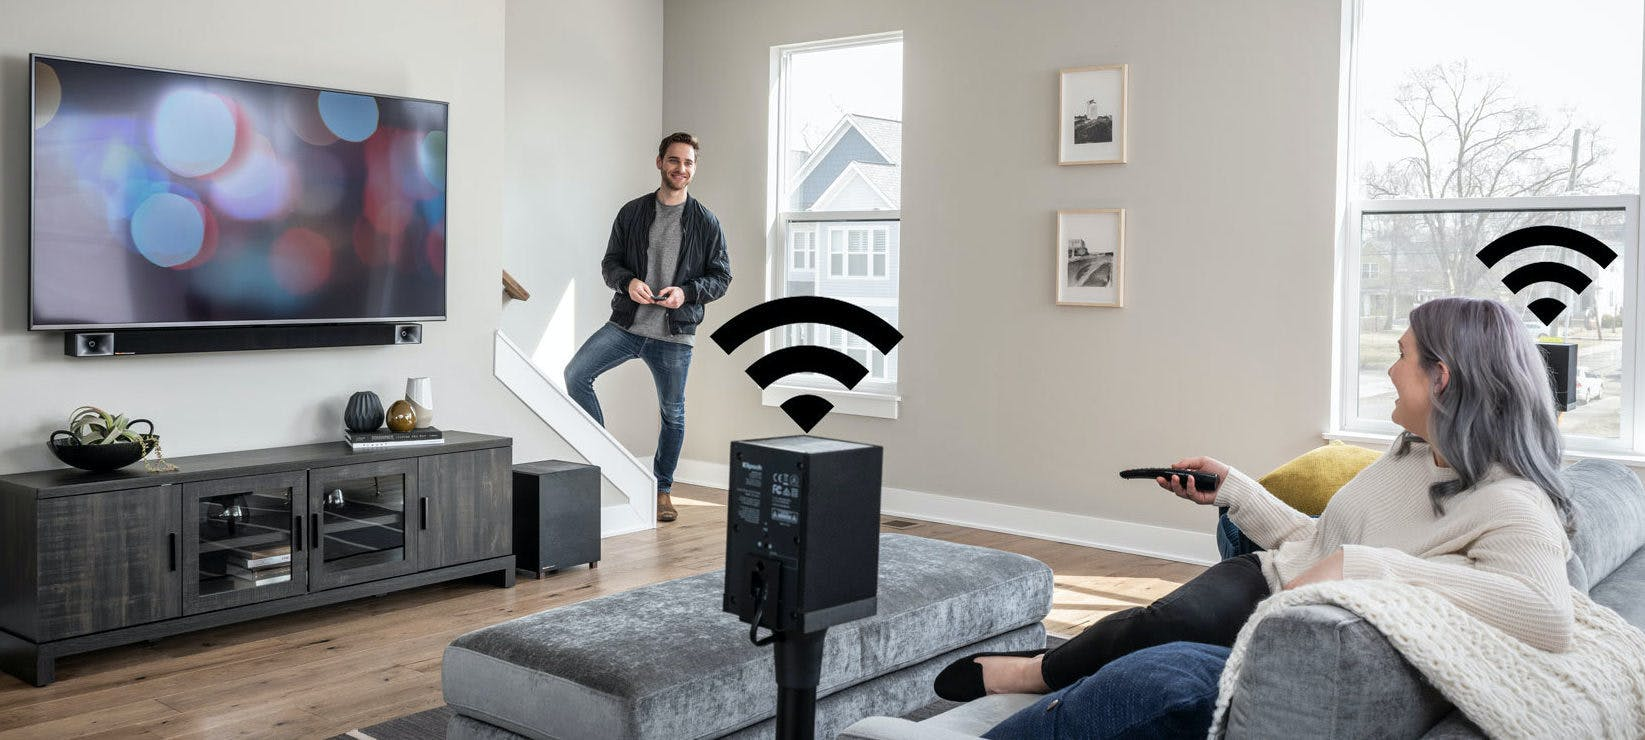 Best Surround Speaker Home Theater System